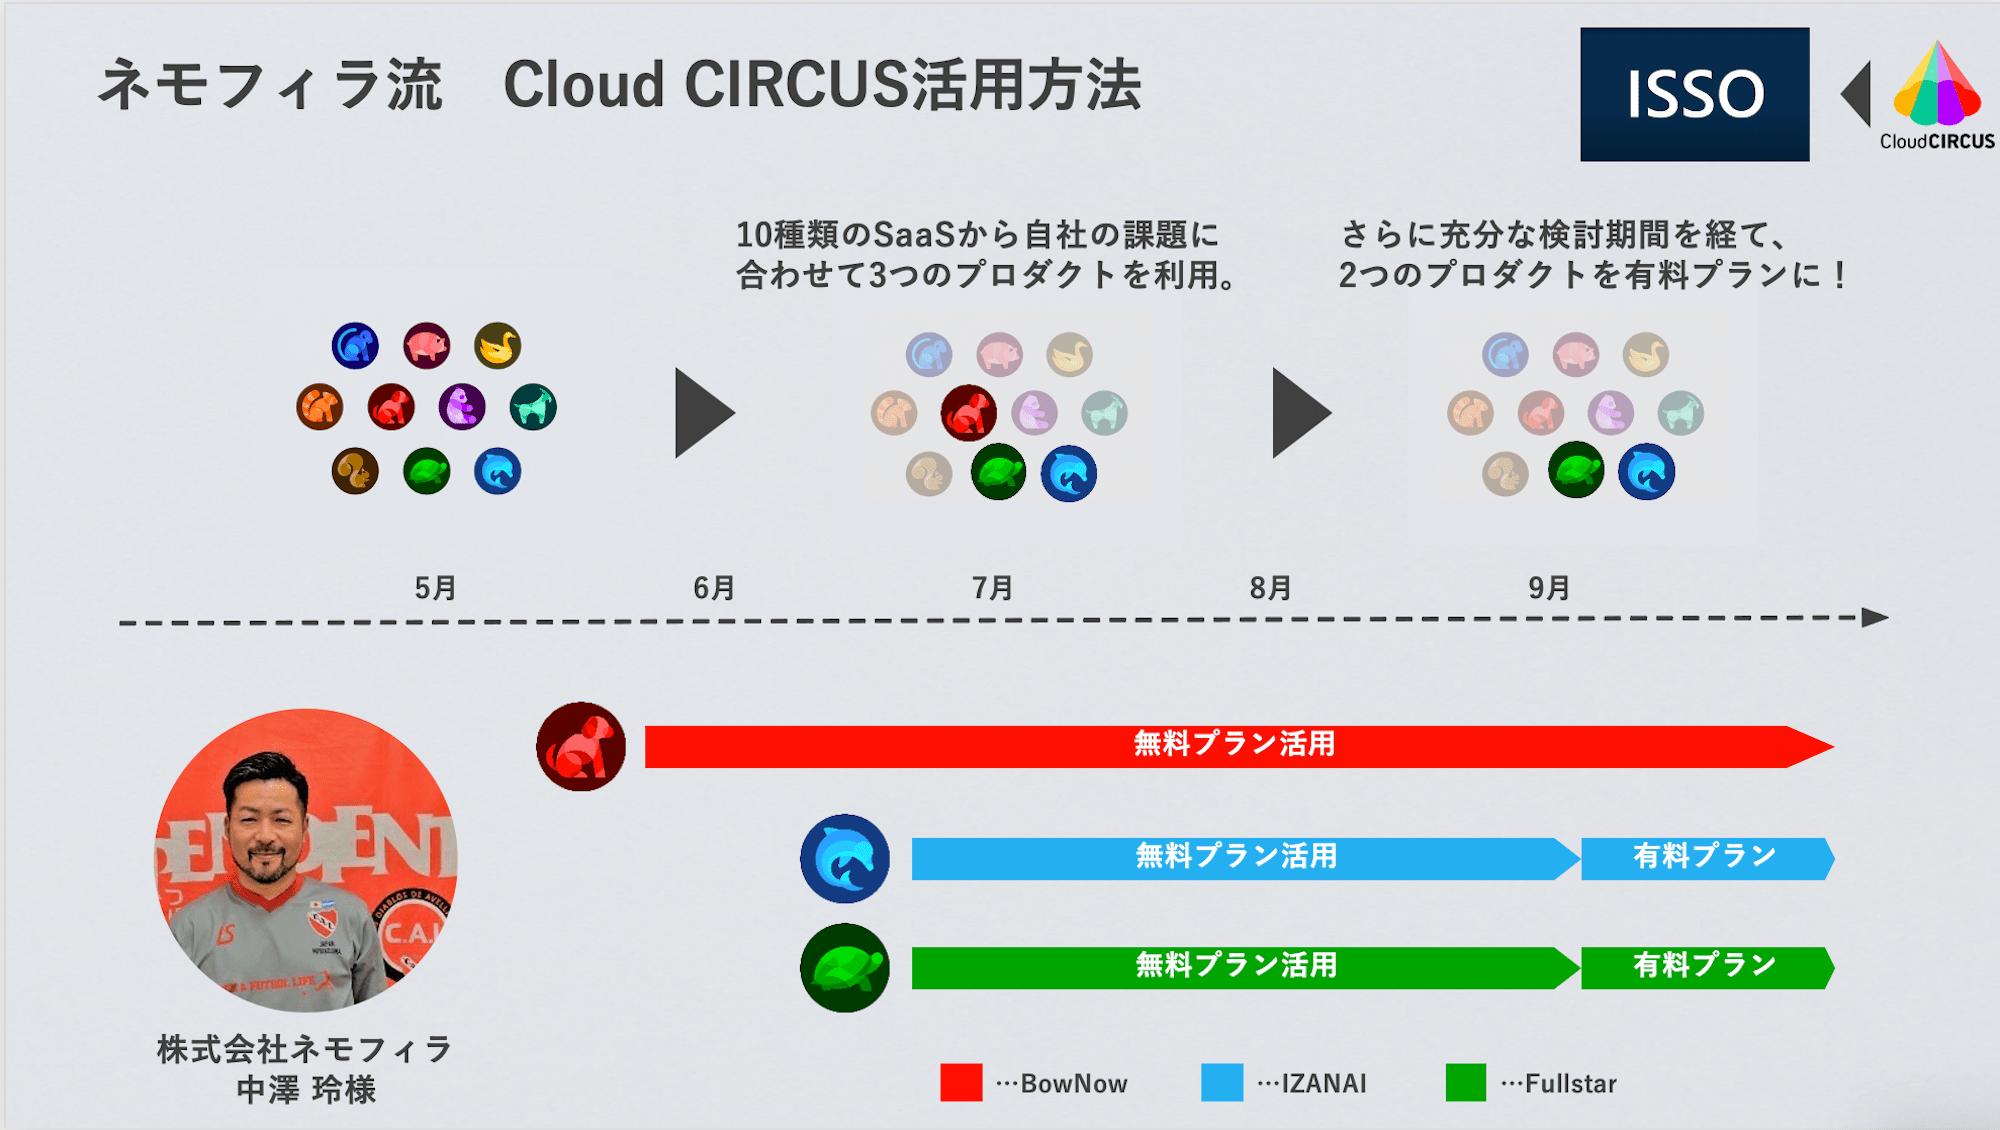 """UI検証SaaSツールISSO"" 複数のCloud CIRCUS製品を導入し実現させる、顧客体験価値の最大化|株式会社ネモフィラ様"